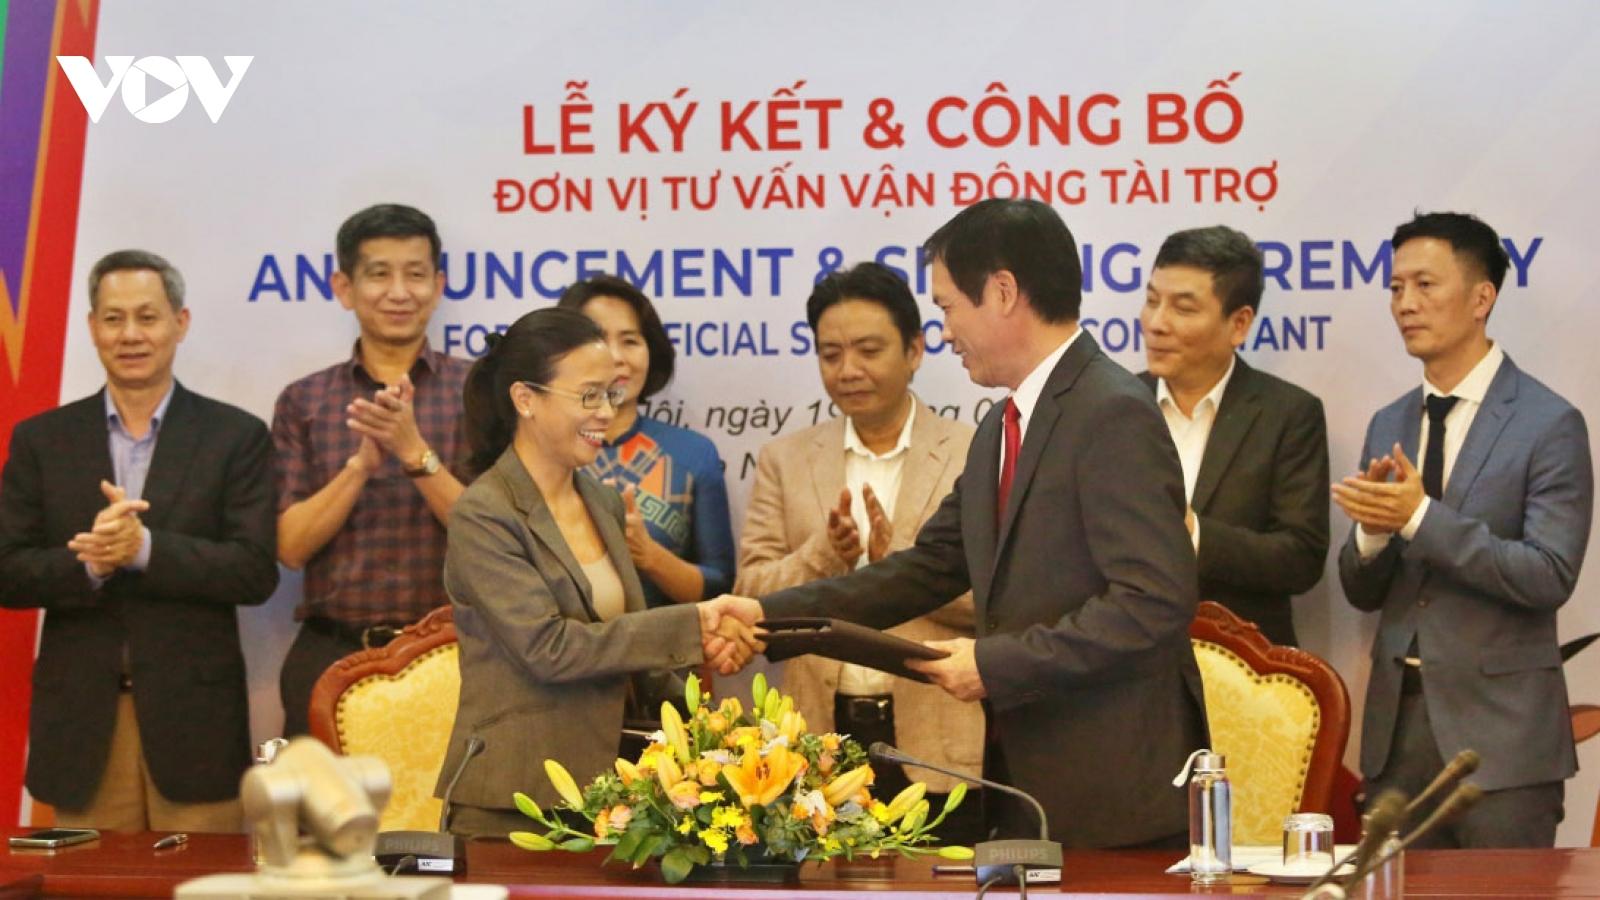 Vietcontent officially sponsors SEA Games 31, ASEAN Para Games 11